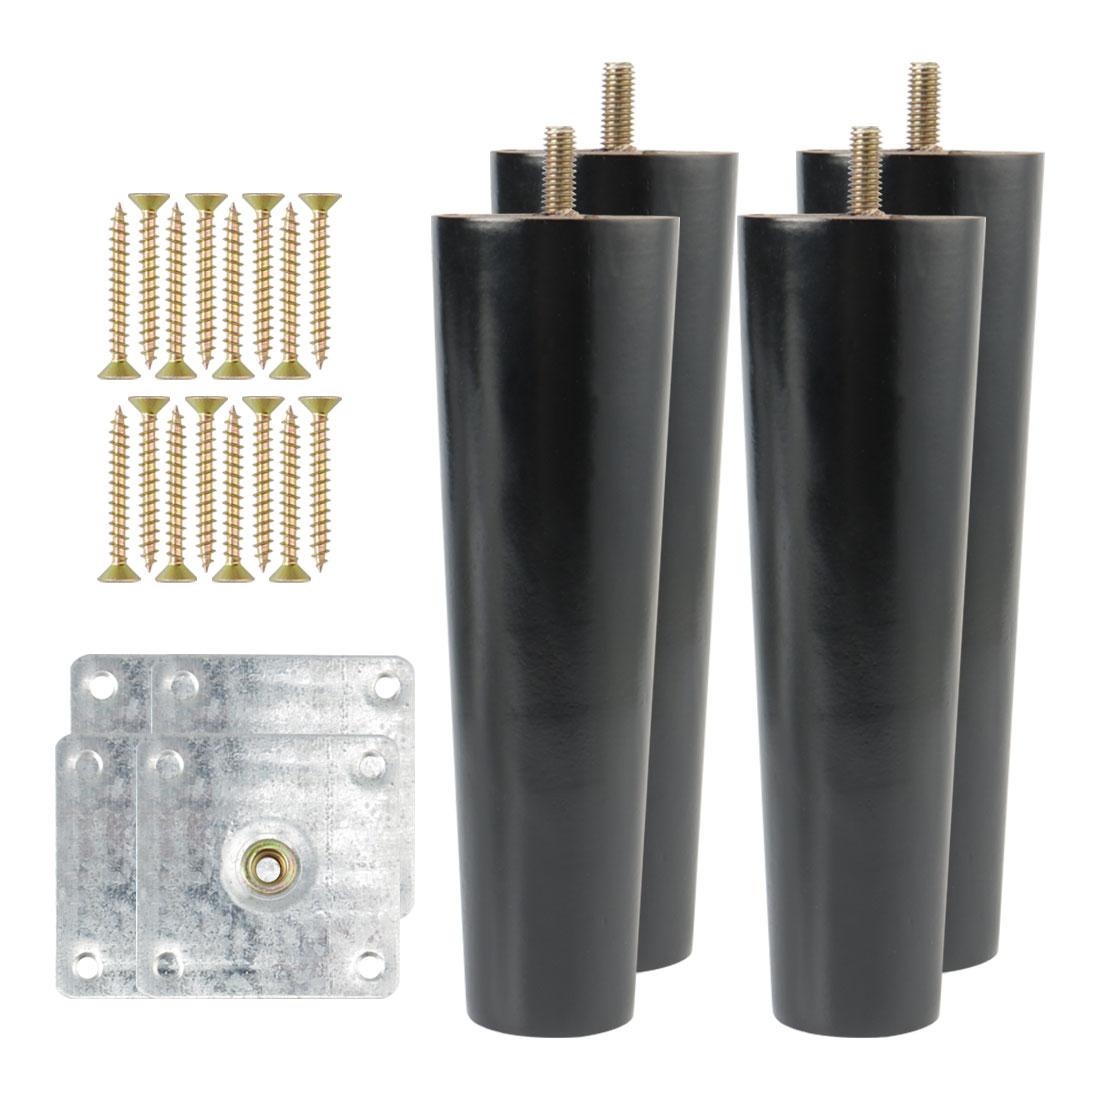 "7"" Solid Wood Furniture Leg Table Feet Hoist Adjuster Replacement Black Set of 4"